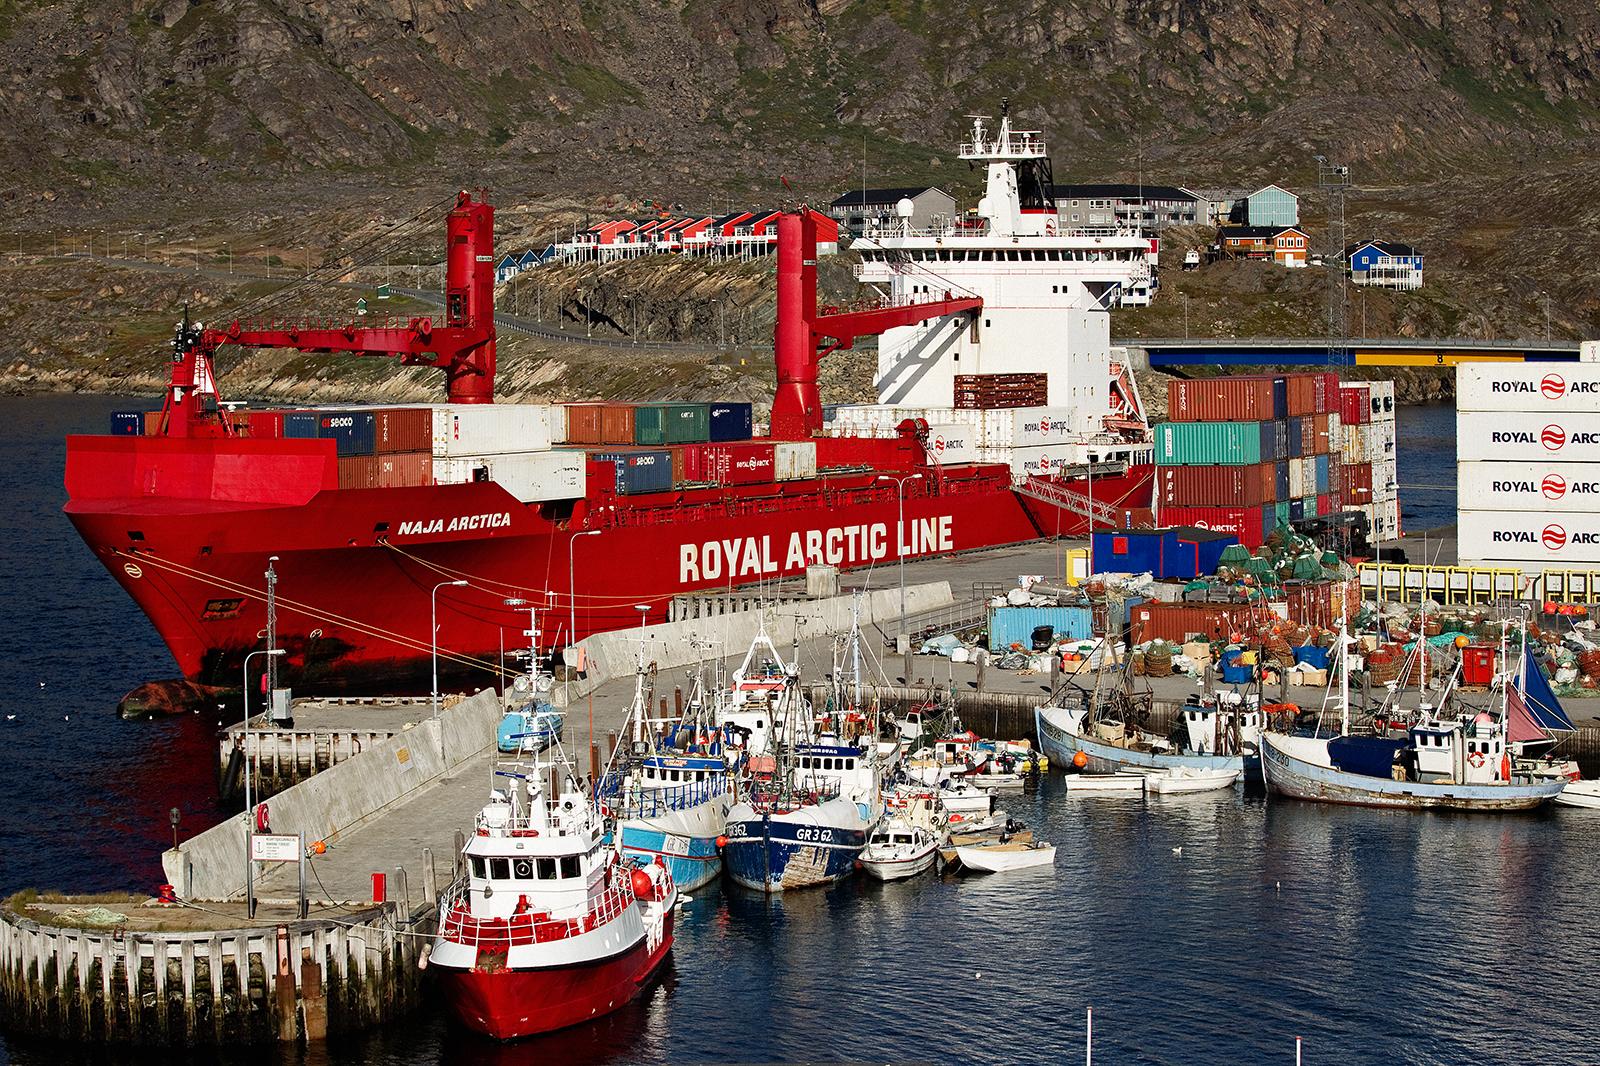 Arctic Line : Naja arctica royal arctic line